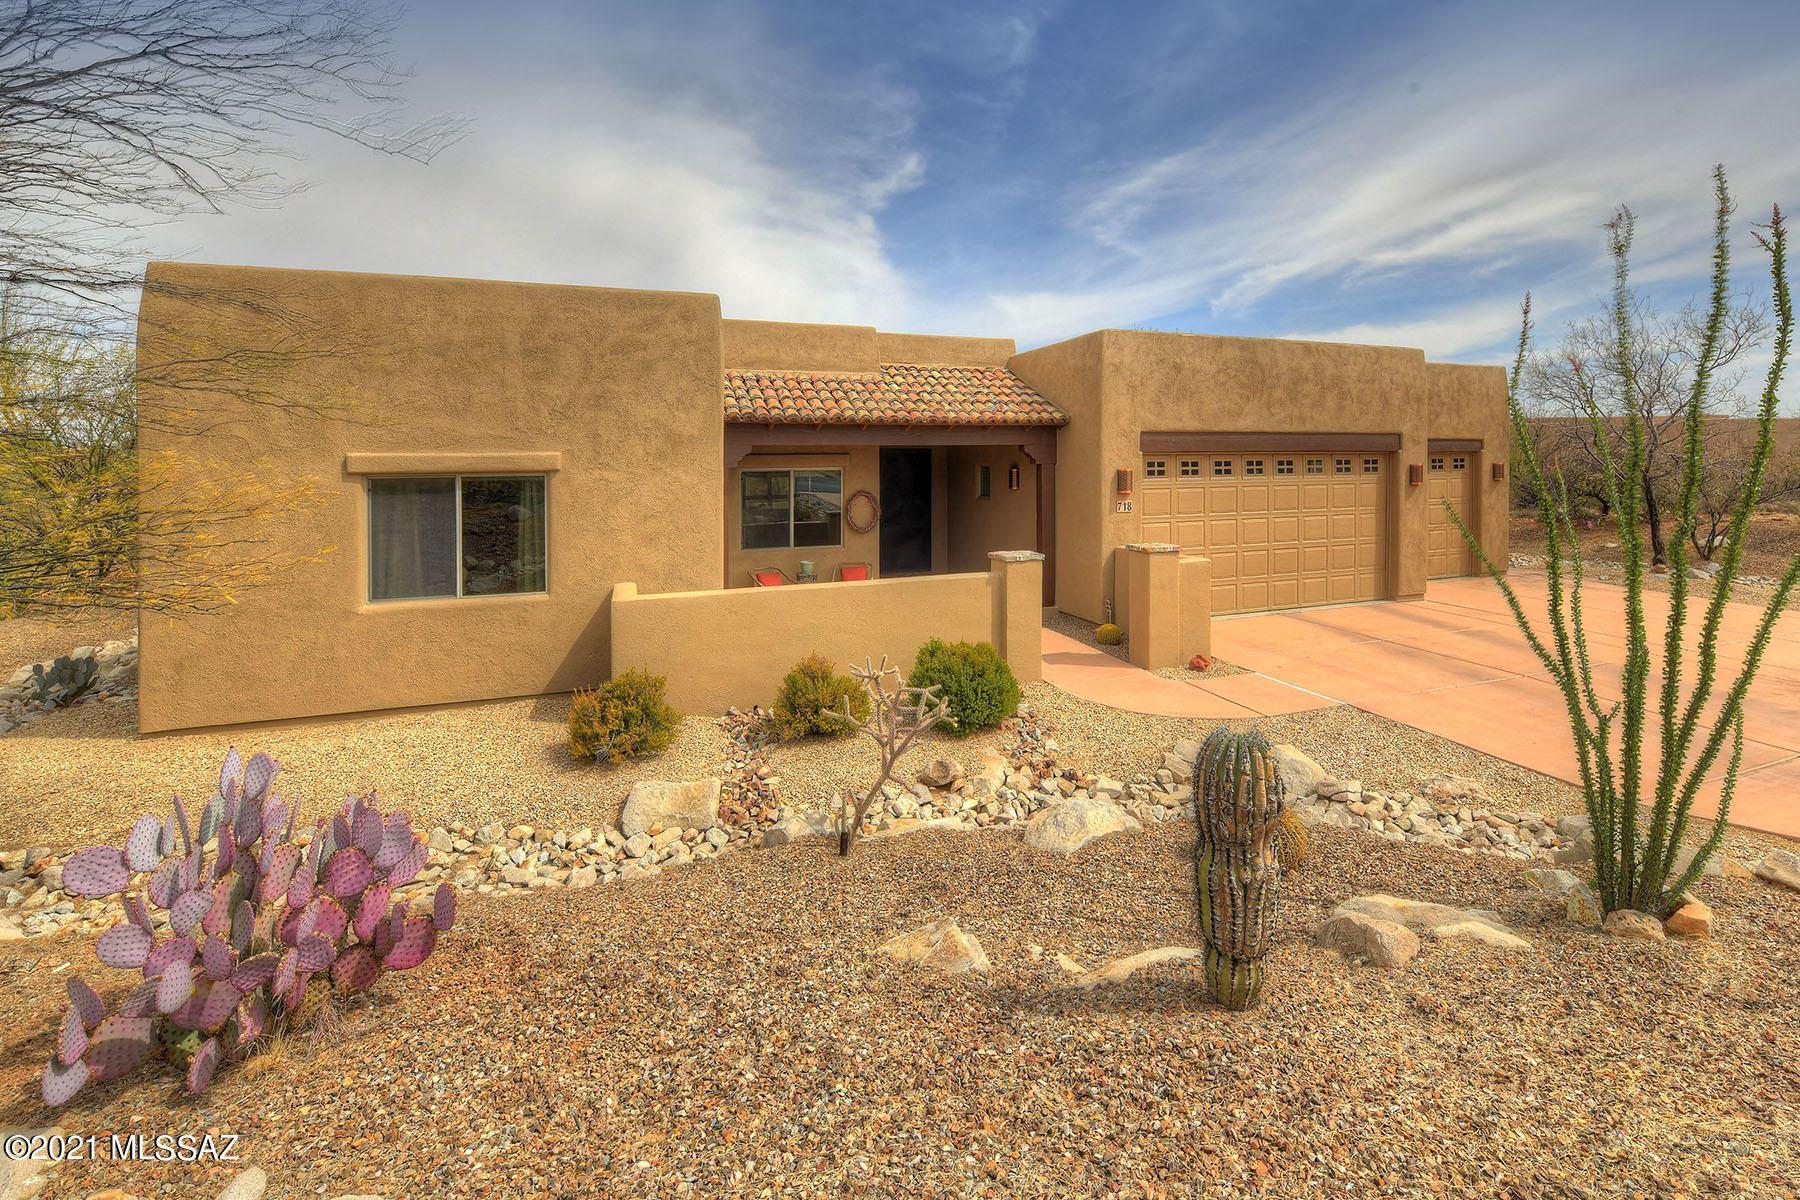 718 W Placita Quieta, Green Valley, AZ 85614 - MLS#: 22108959